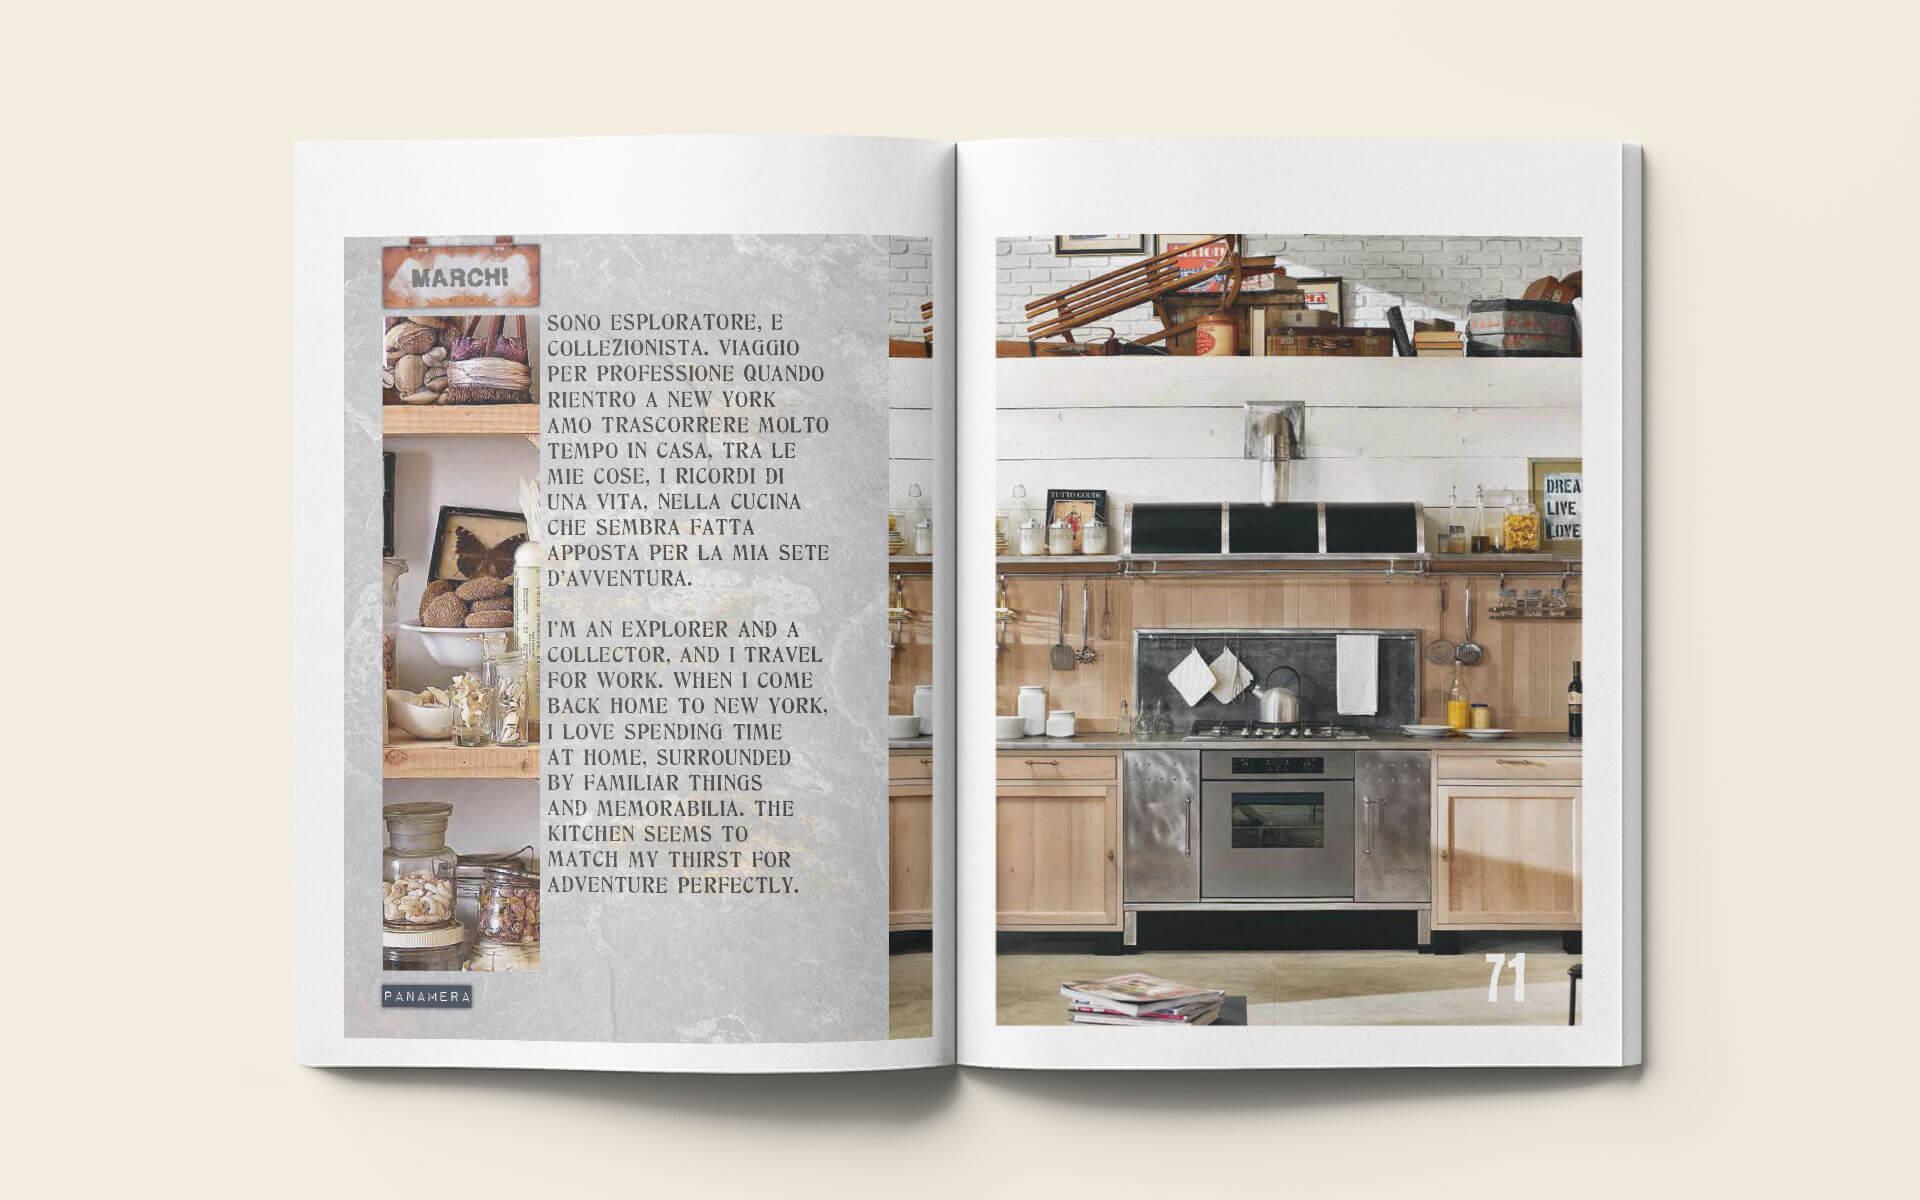 Catalogo Panamera - Marchi Cucine Made in Italy